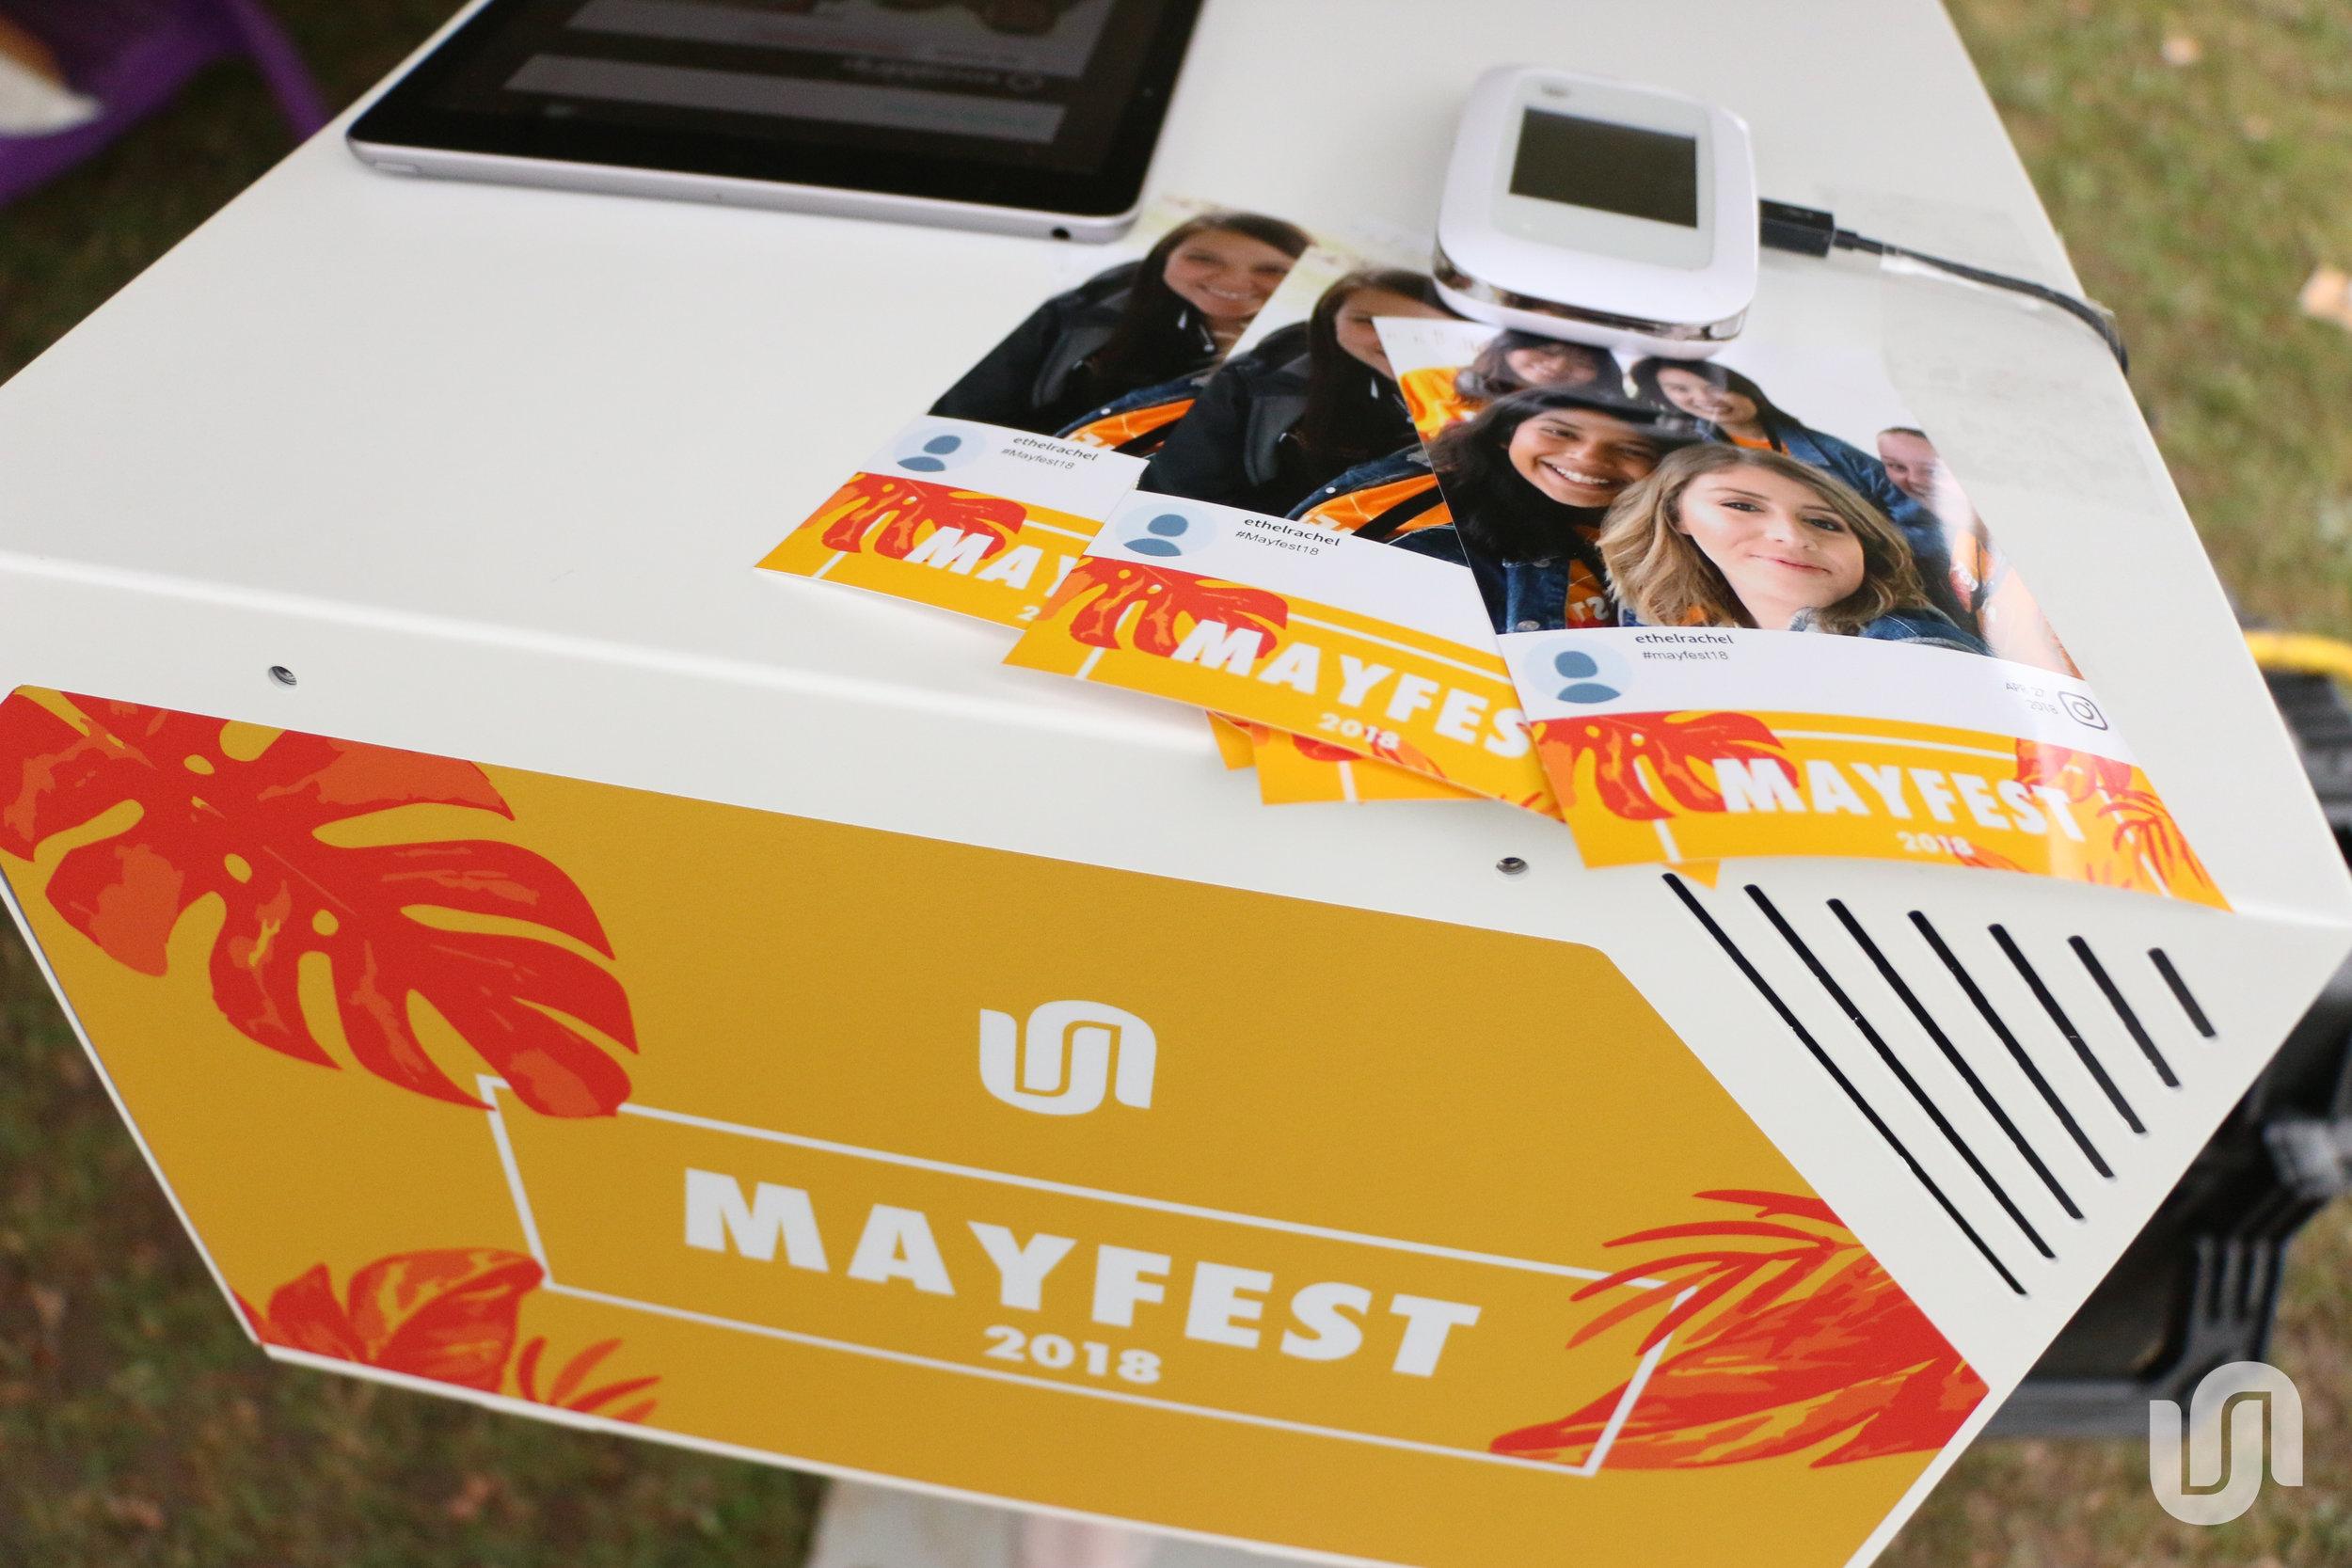 Mayfest-BP-4.jpg